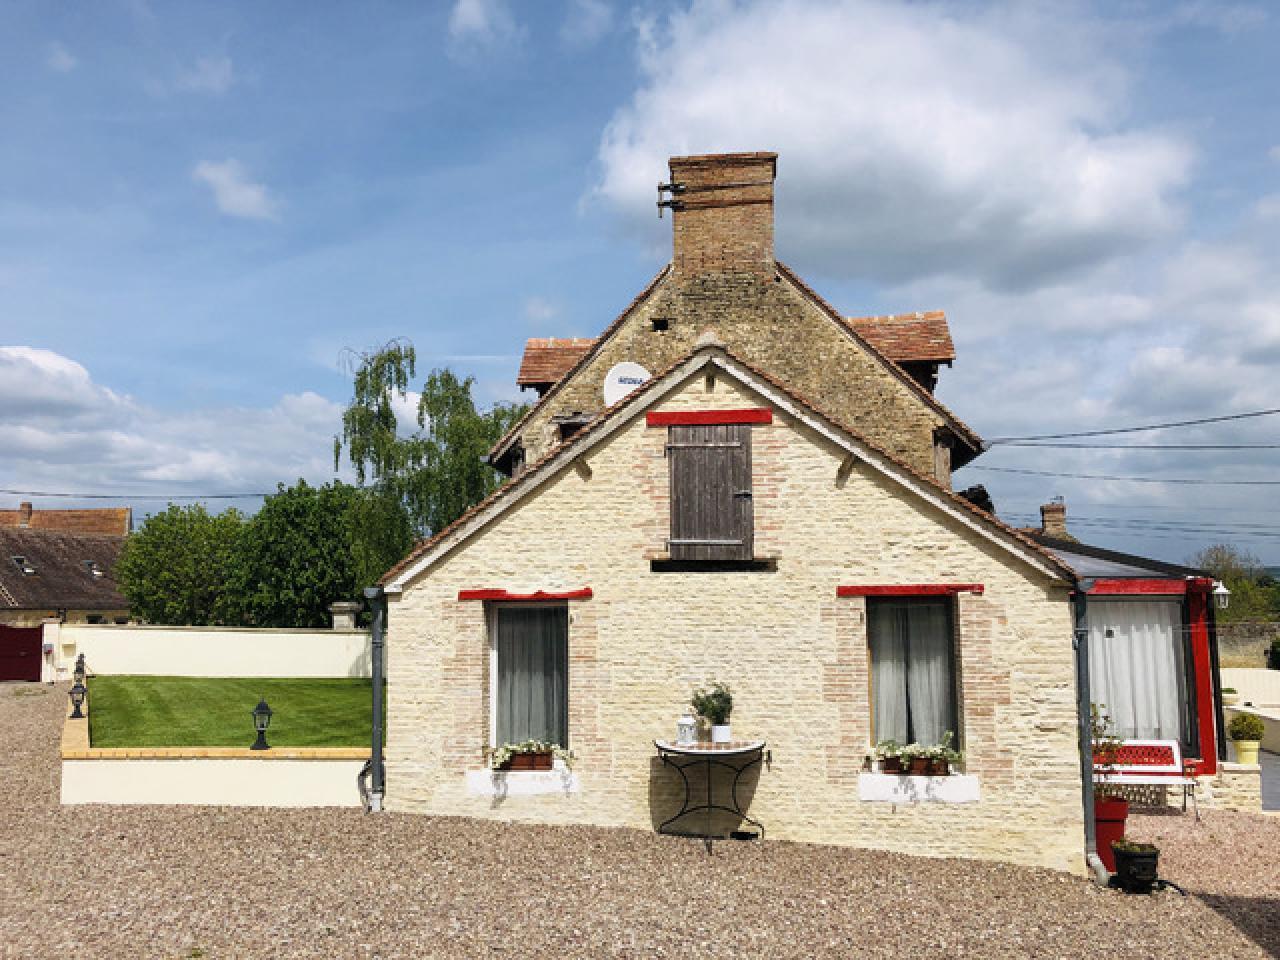 Продаю Дом в Нормандии Франция - 12